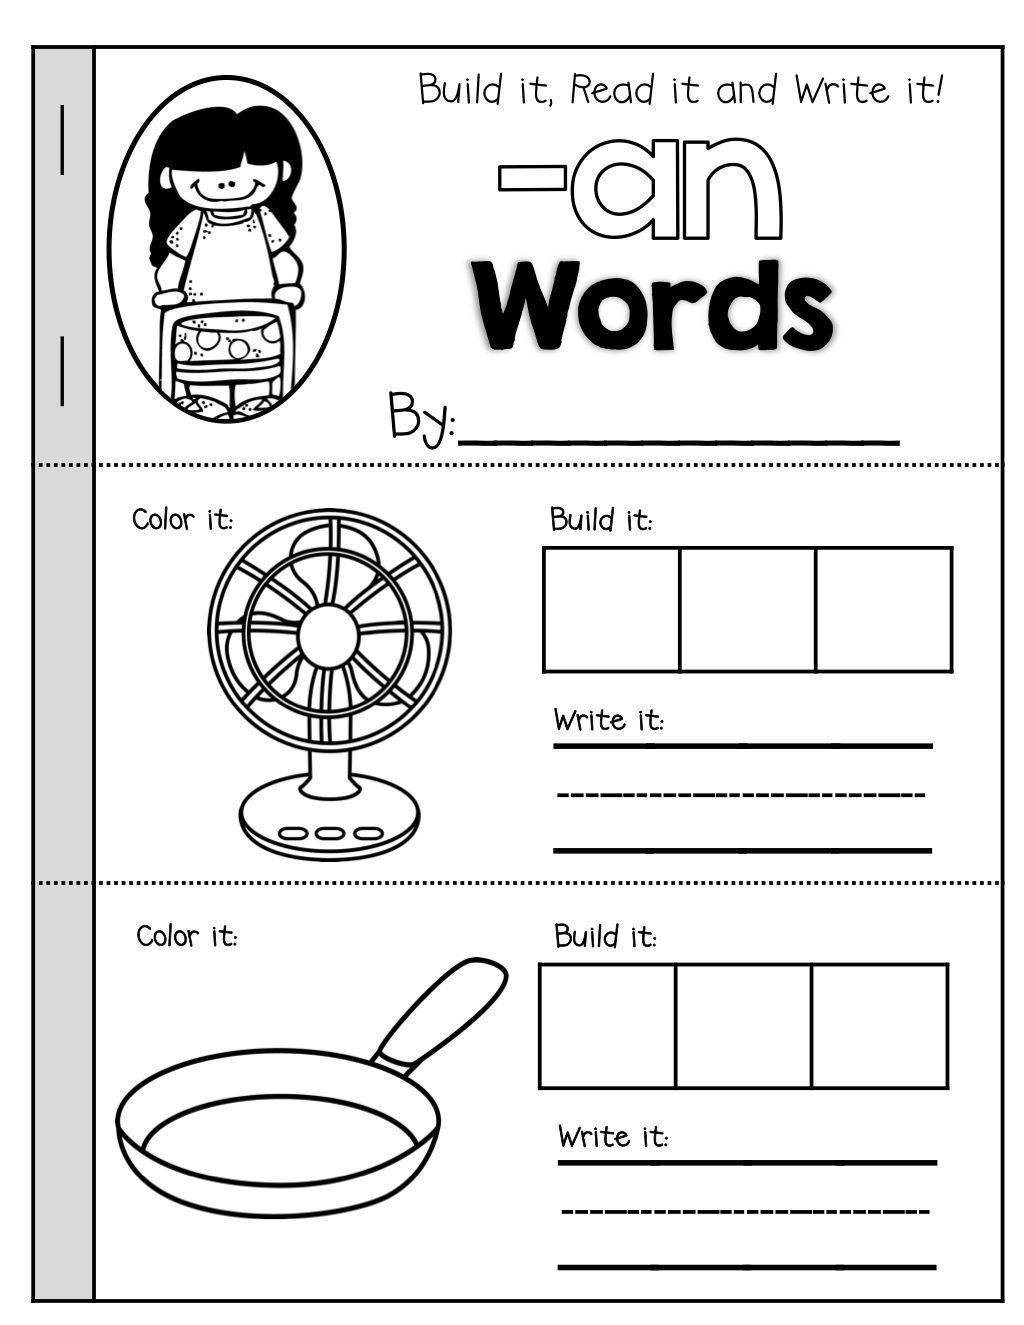 Cvc Booklets (Build It, Read It, Write It)! | Grand Education - Free Printable Word Family Mini Books